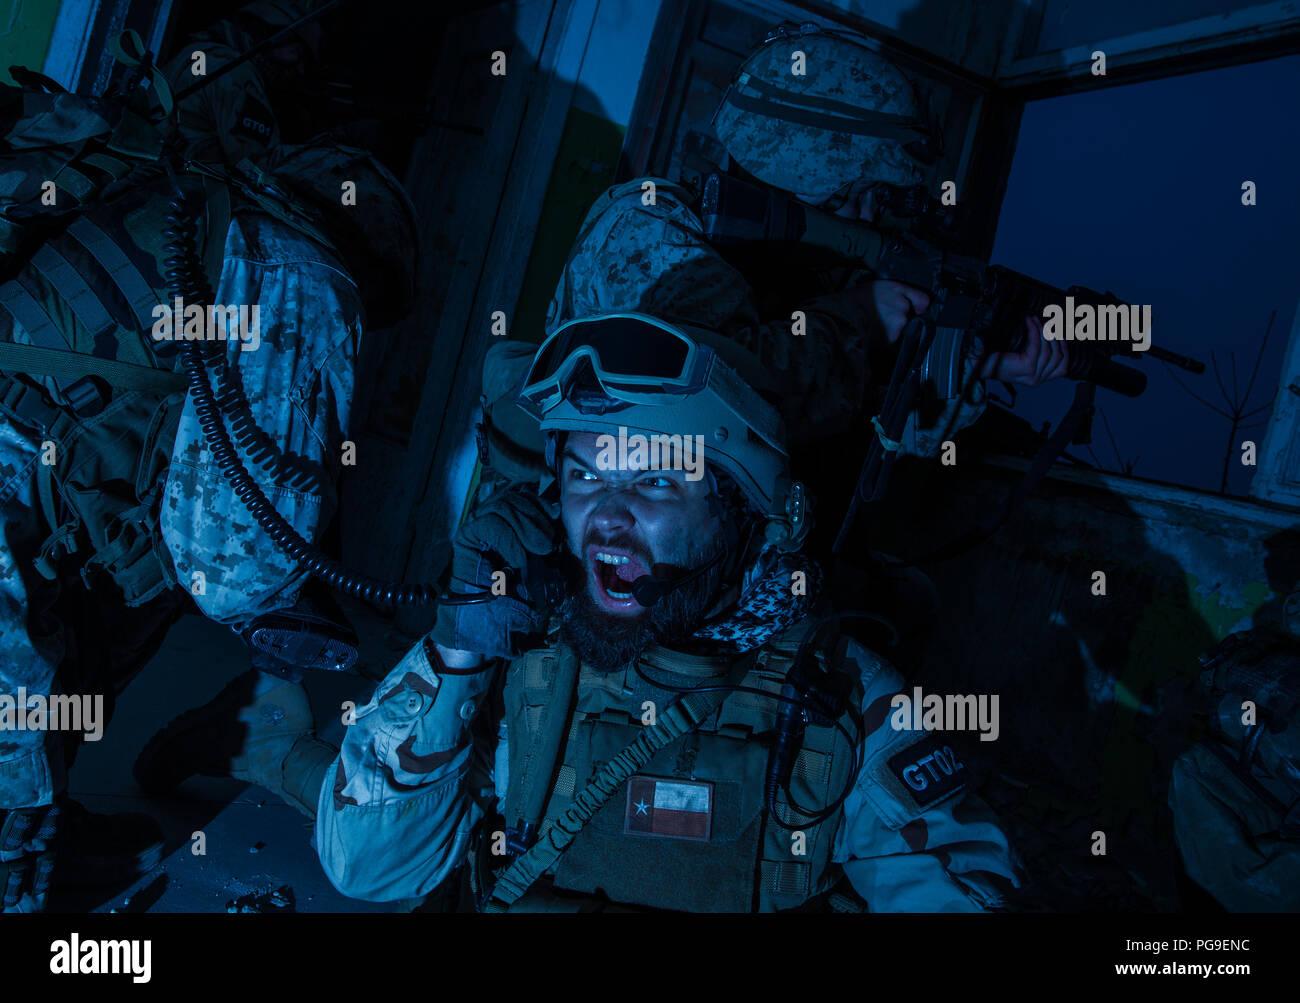 Army team leader coordinating teammates with radio - Stock Image